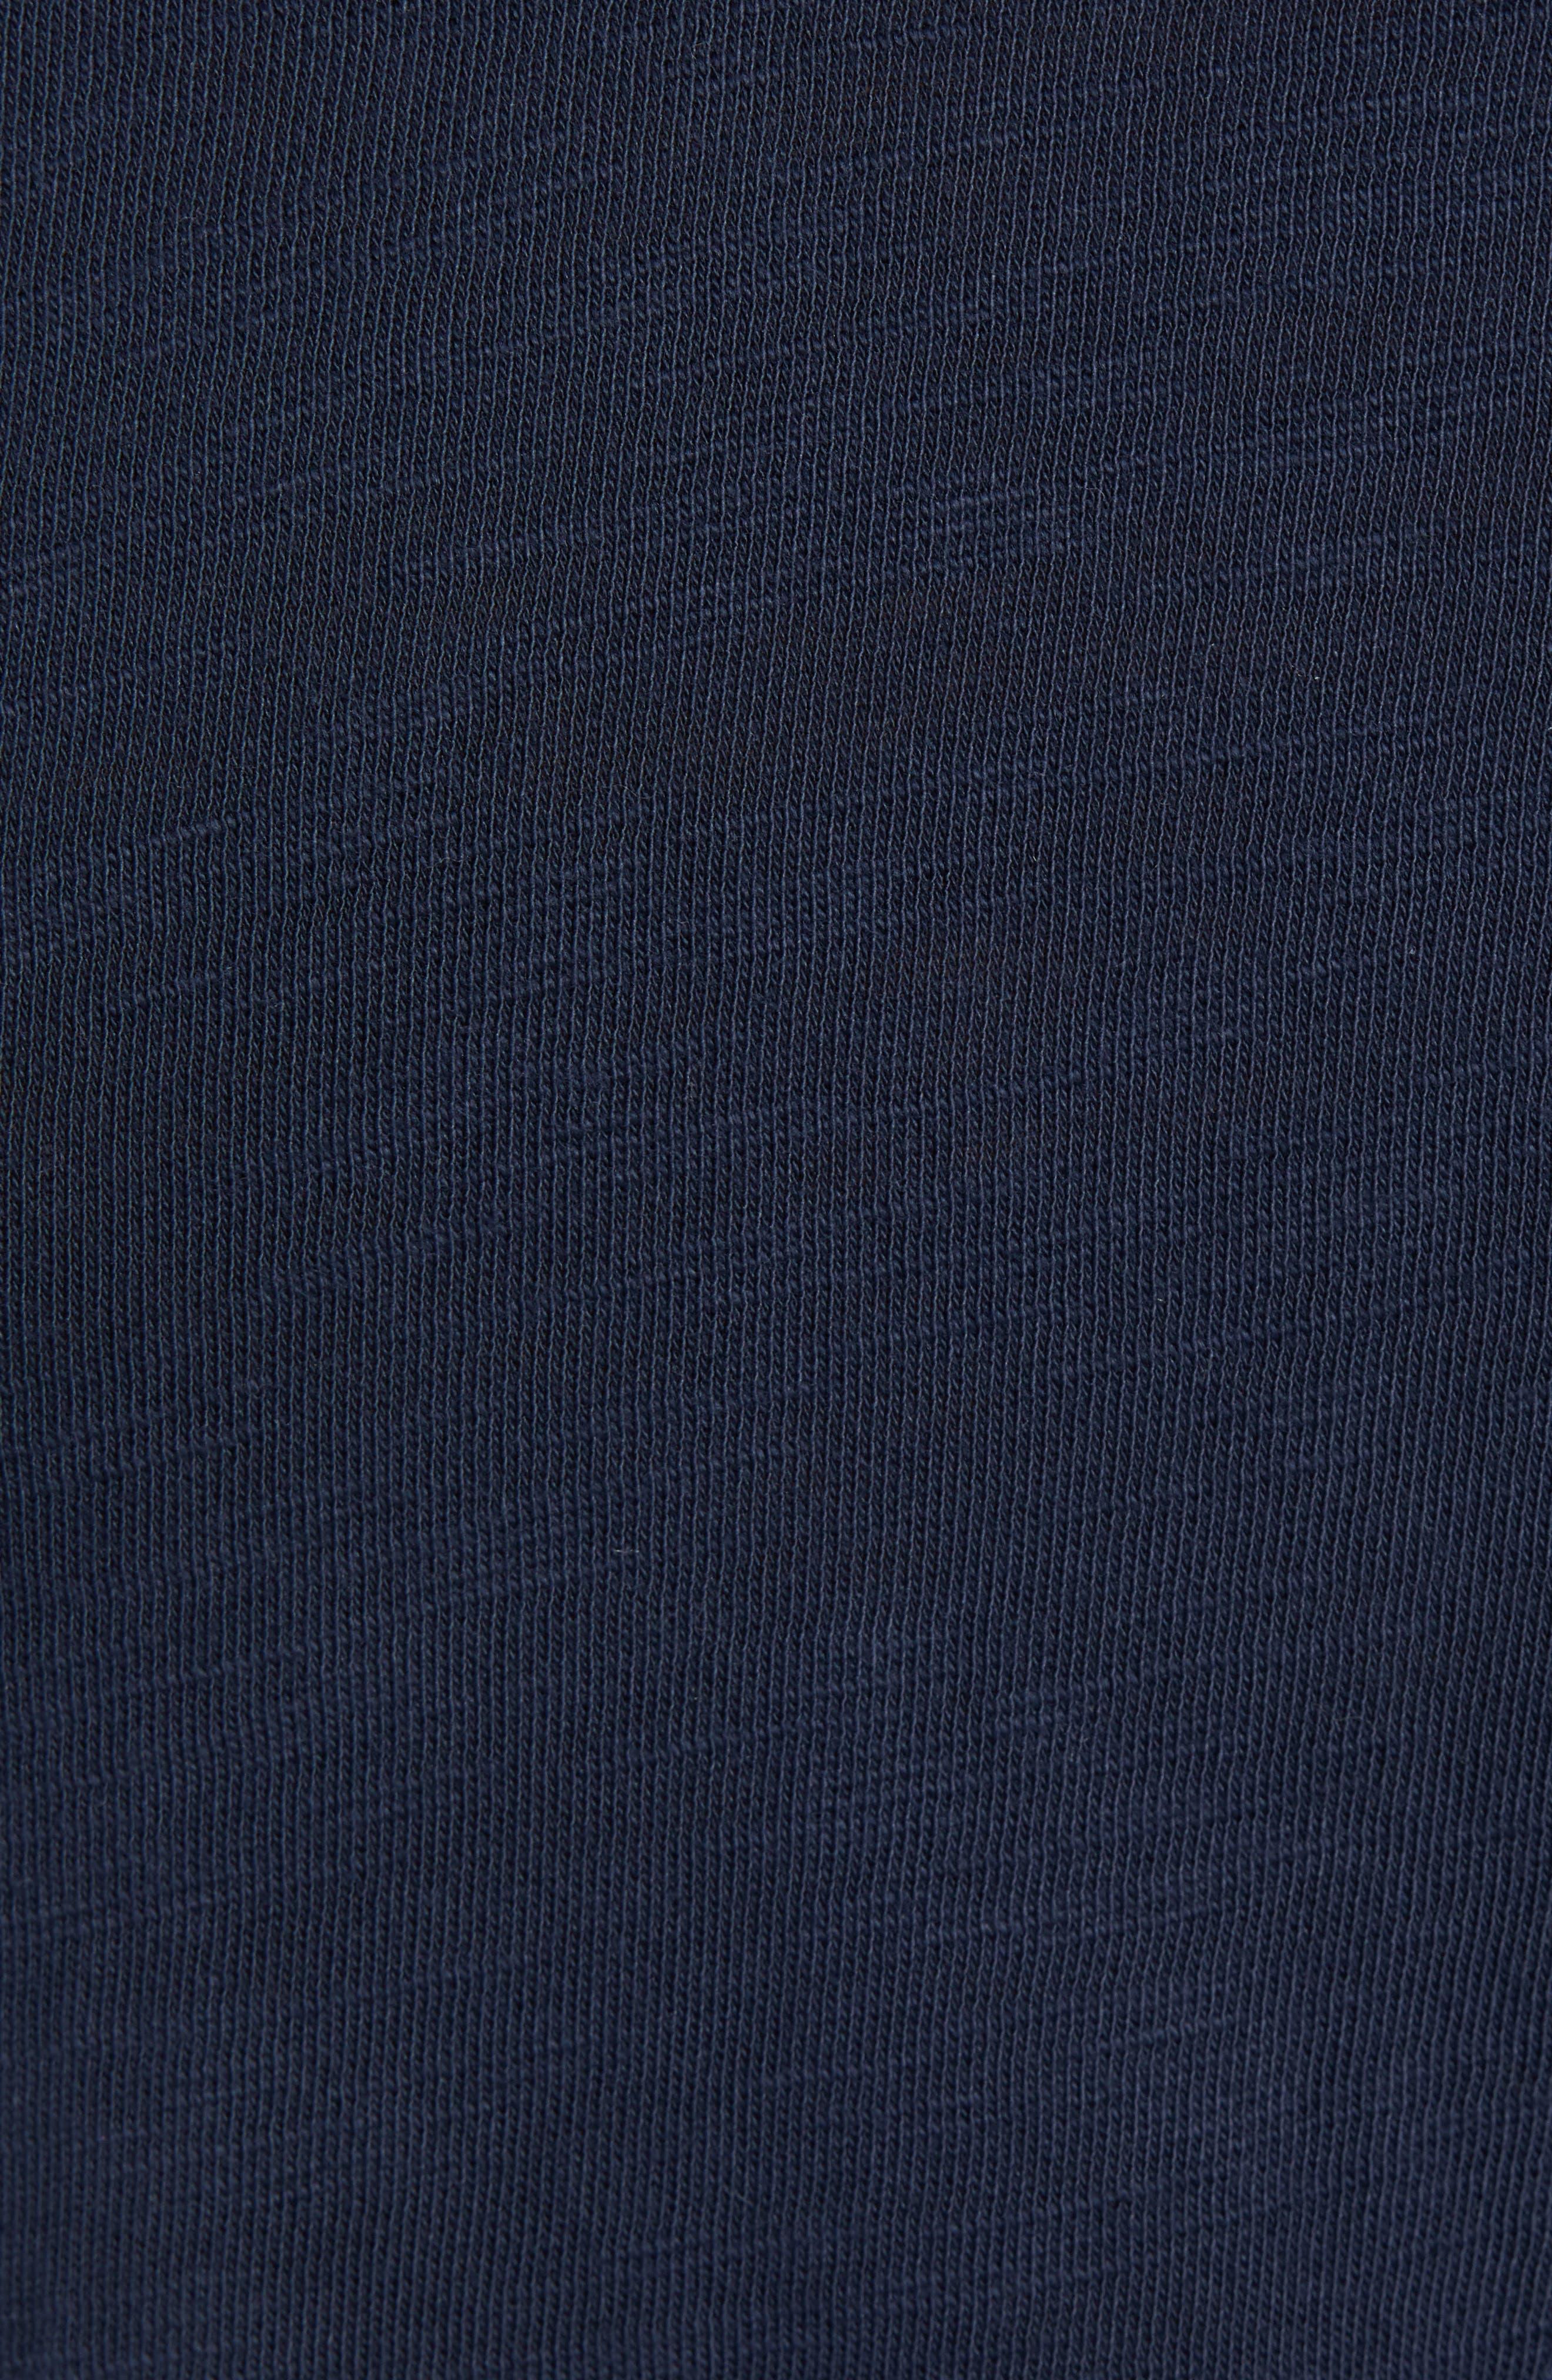 Standard Issue Henley T-Shirt,                             Alternate thumbnail 5, color,                             DEEP NAVY